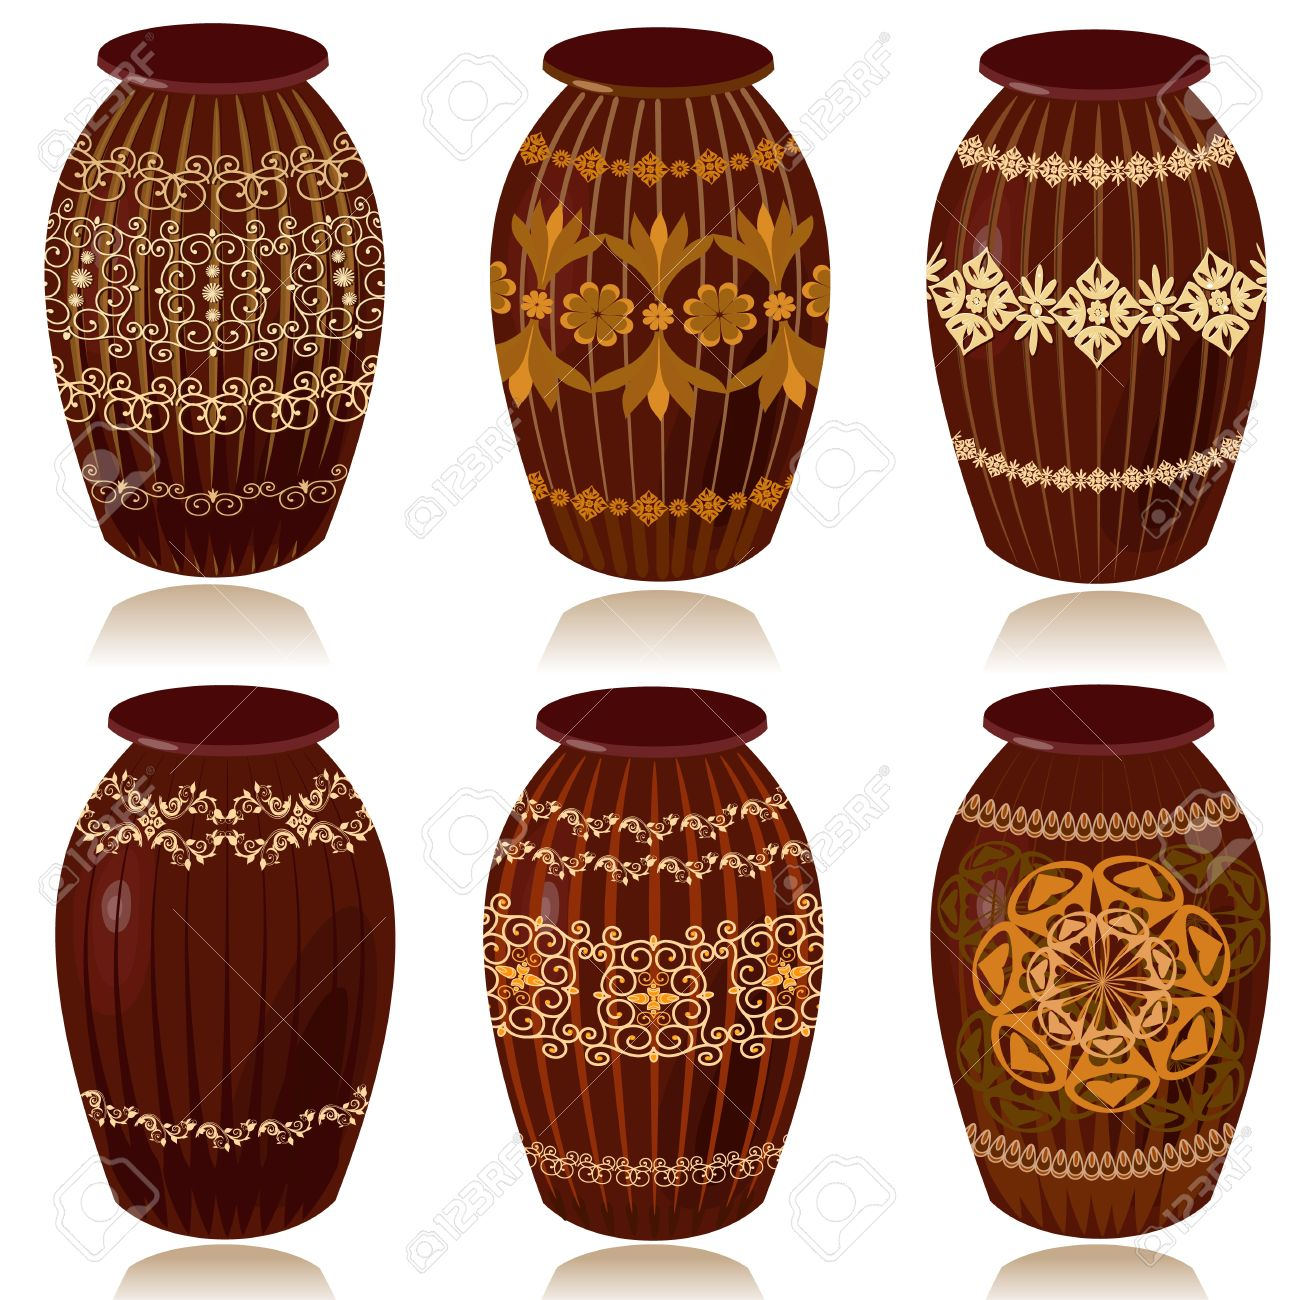 Decorative ceramic vases royalty free cliparts vectors and stock decorative ceramic vases stock vector 9180781 reviewsmspy